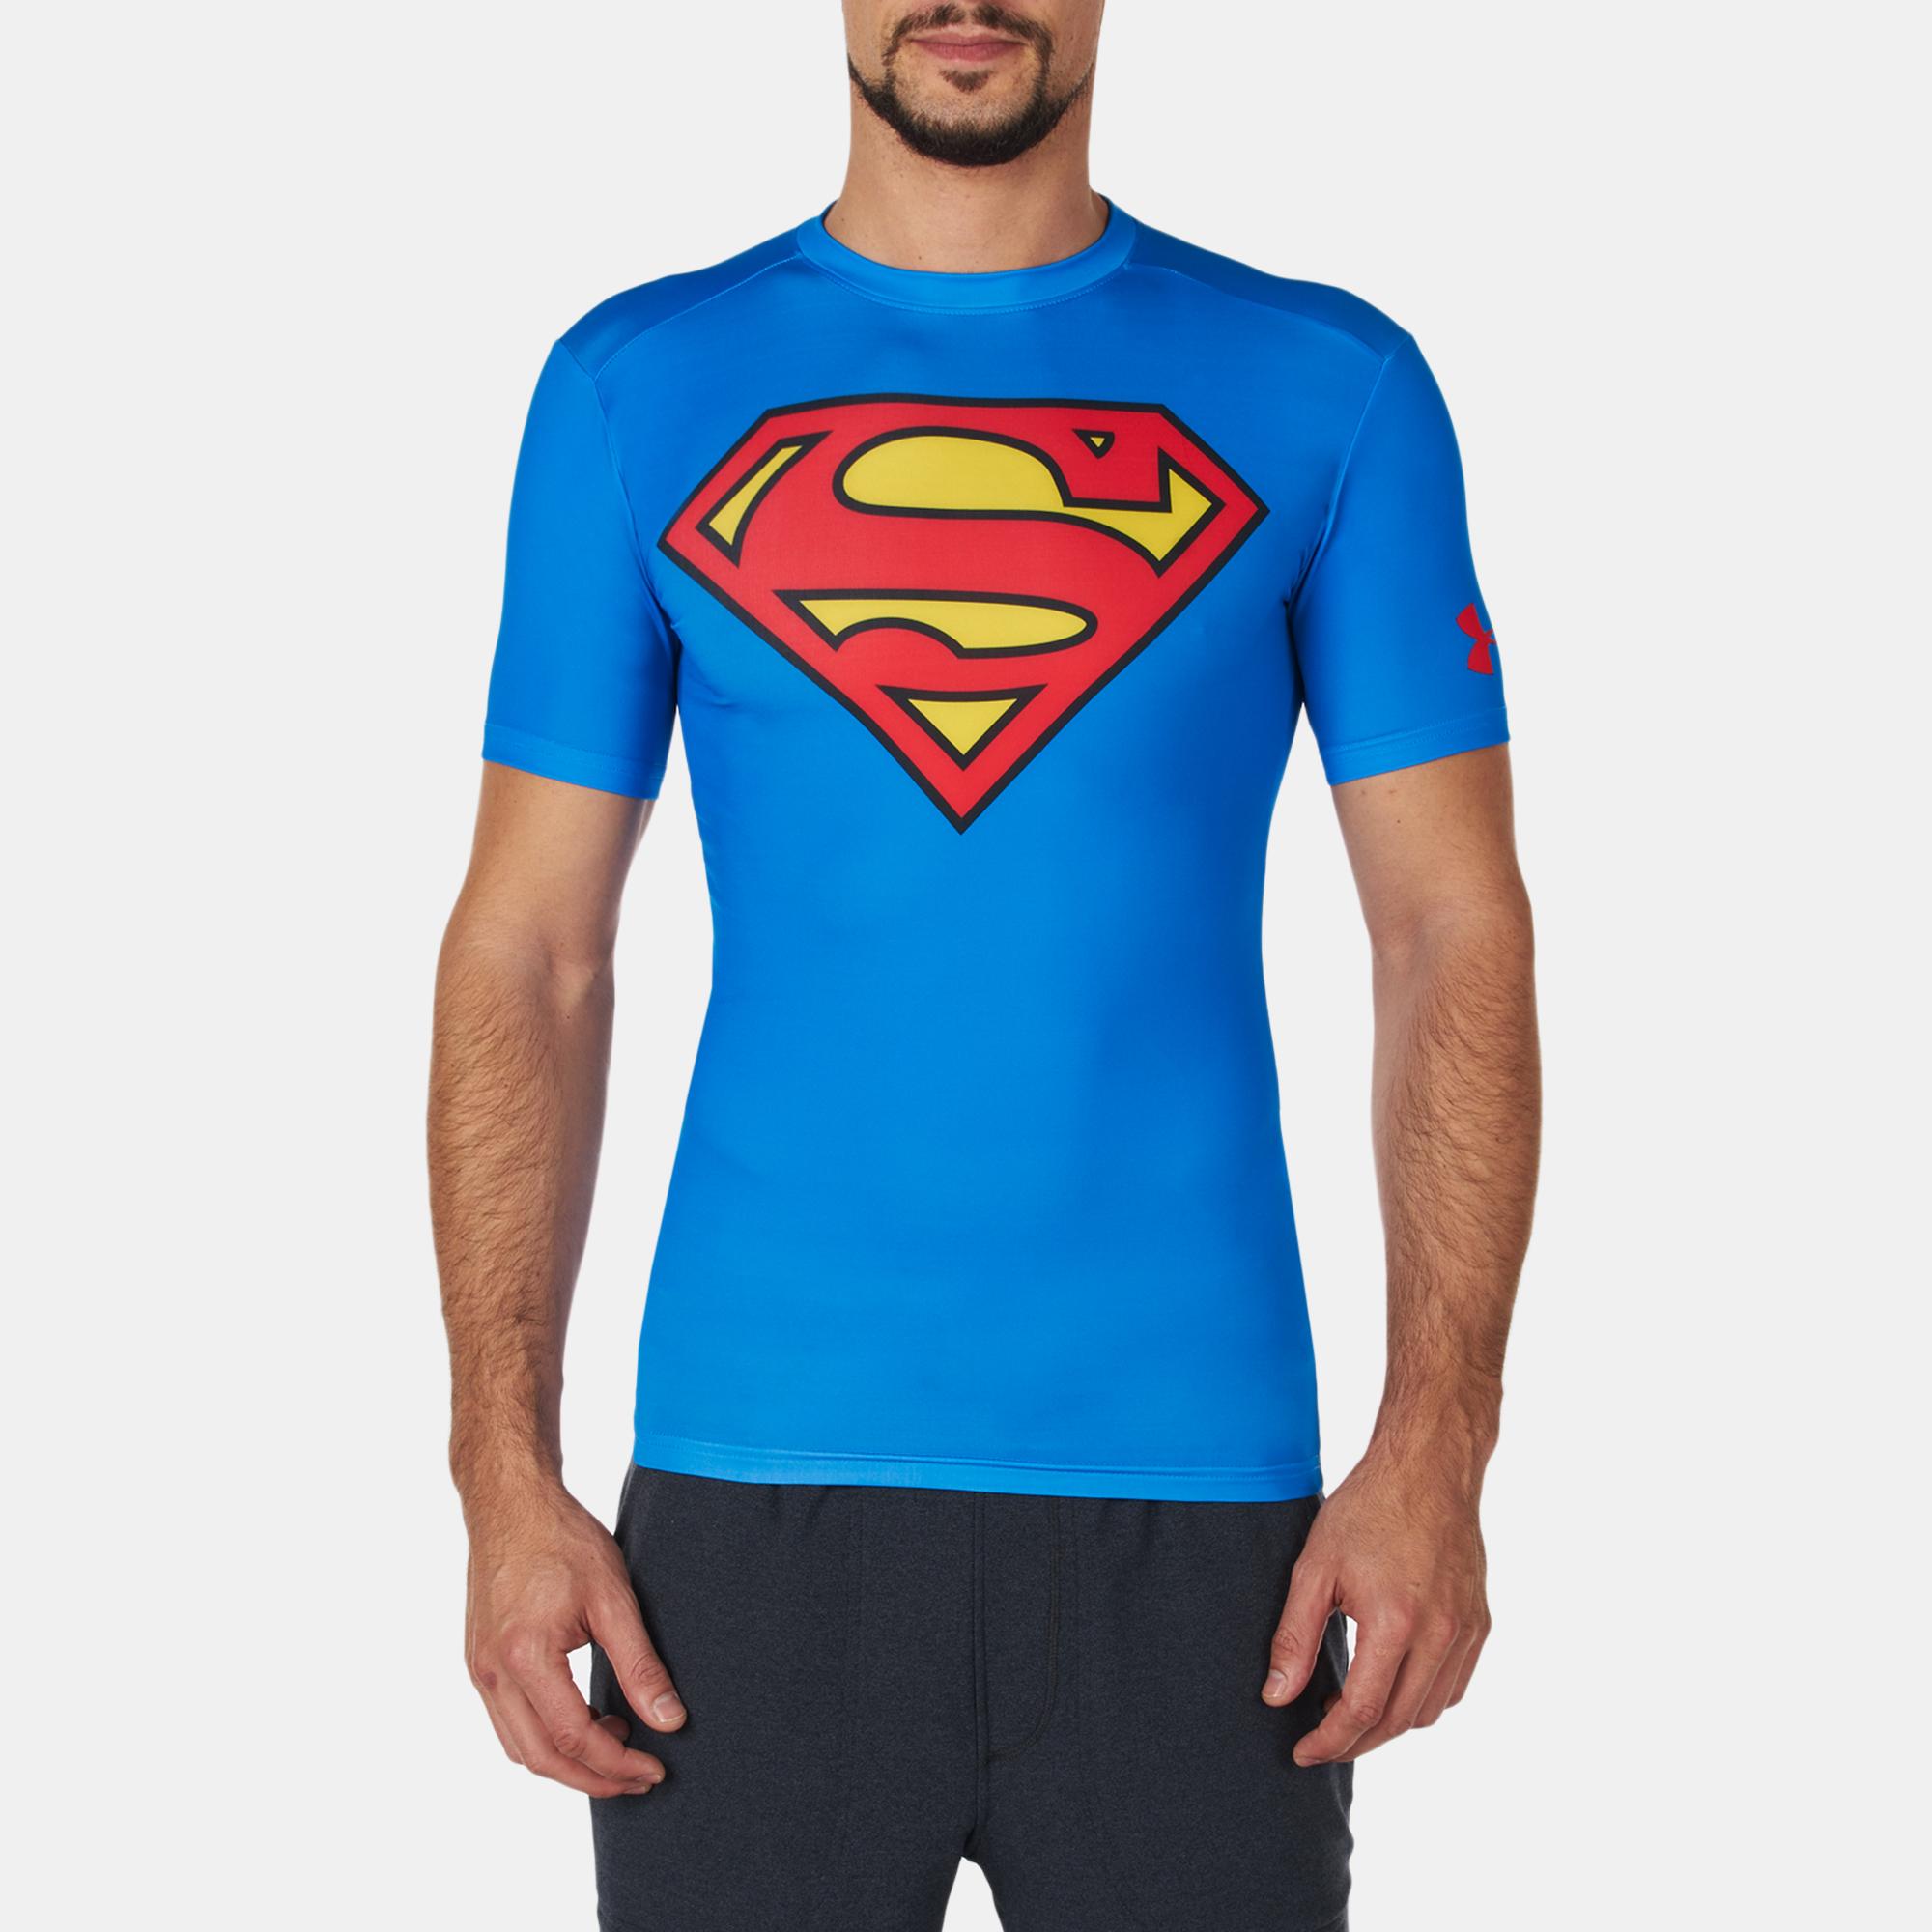 7a2fc812999f Under Armour Compression Shirts Superhero   Top Mode Depot